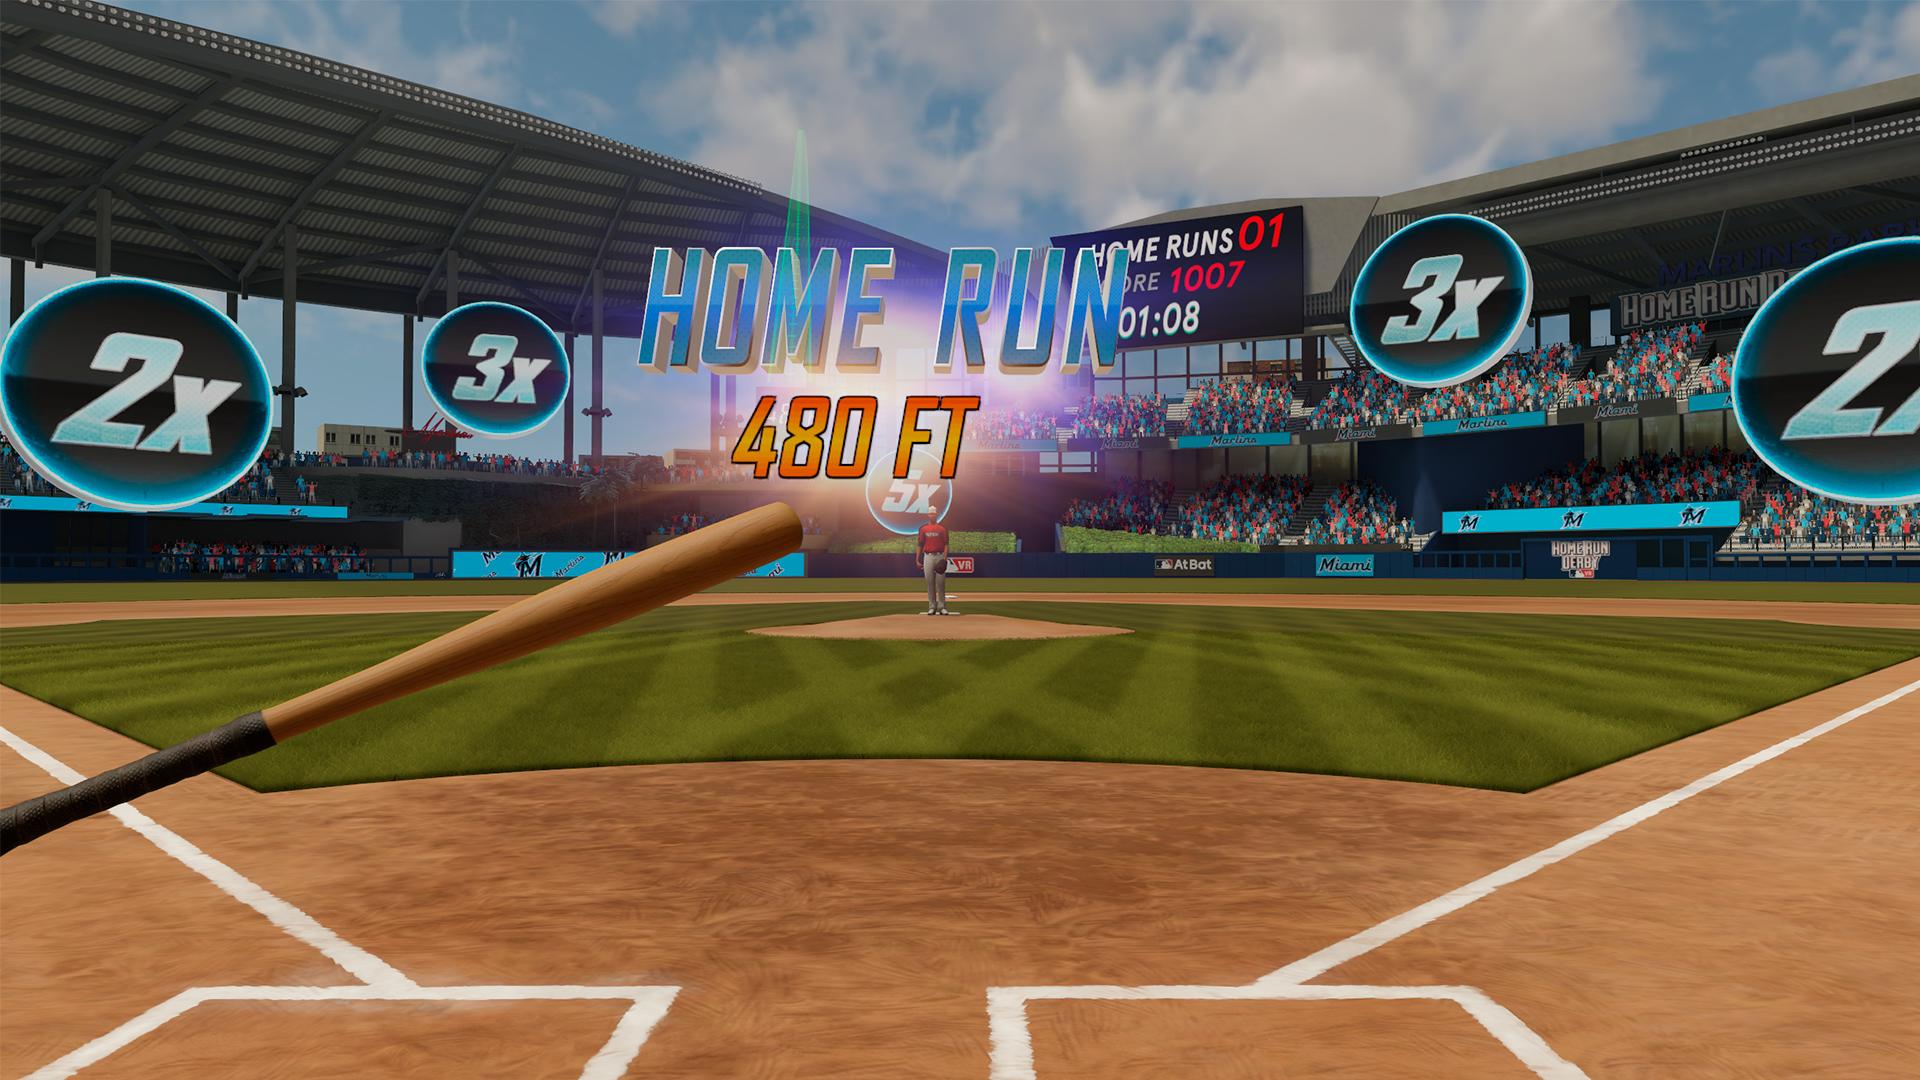 Oculus Quest 游戏《MLB Home Run Derby VR!》美国职棒大联盟本垒打 VR插图(3)